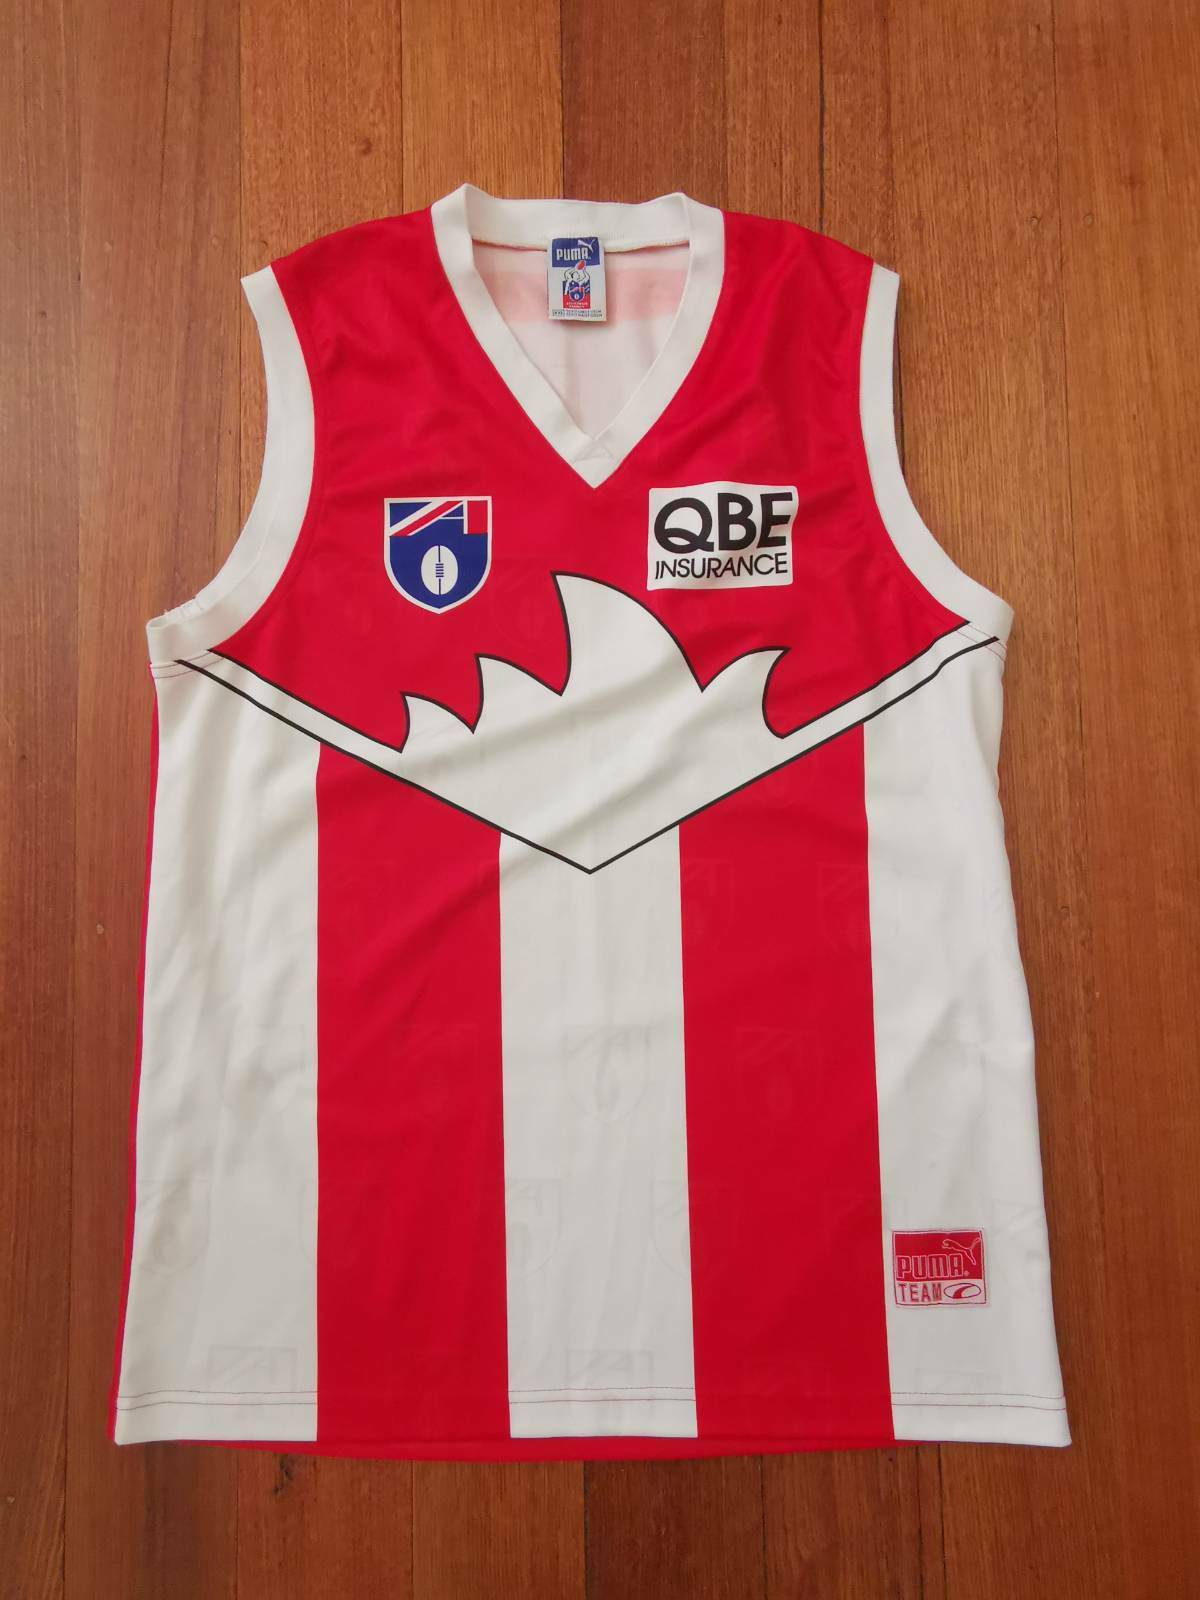 Image 1 - Sydney-Swans-rare-1997-98-Ansett-Cup-preseason-guernsey-jersey-jumper-AFL-90s